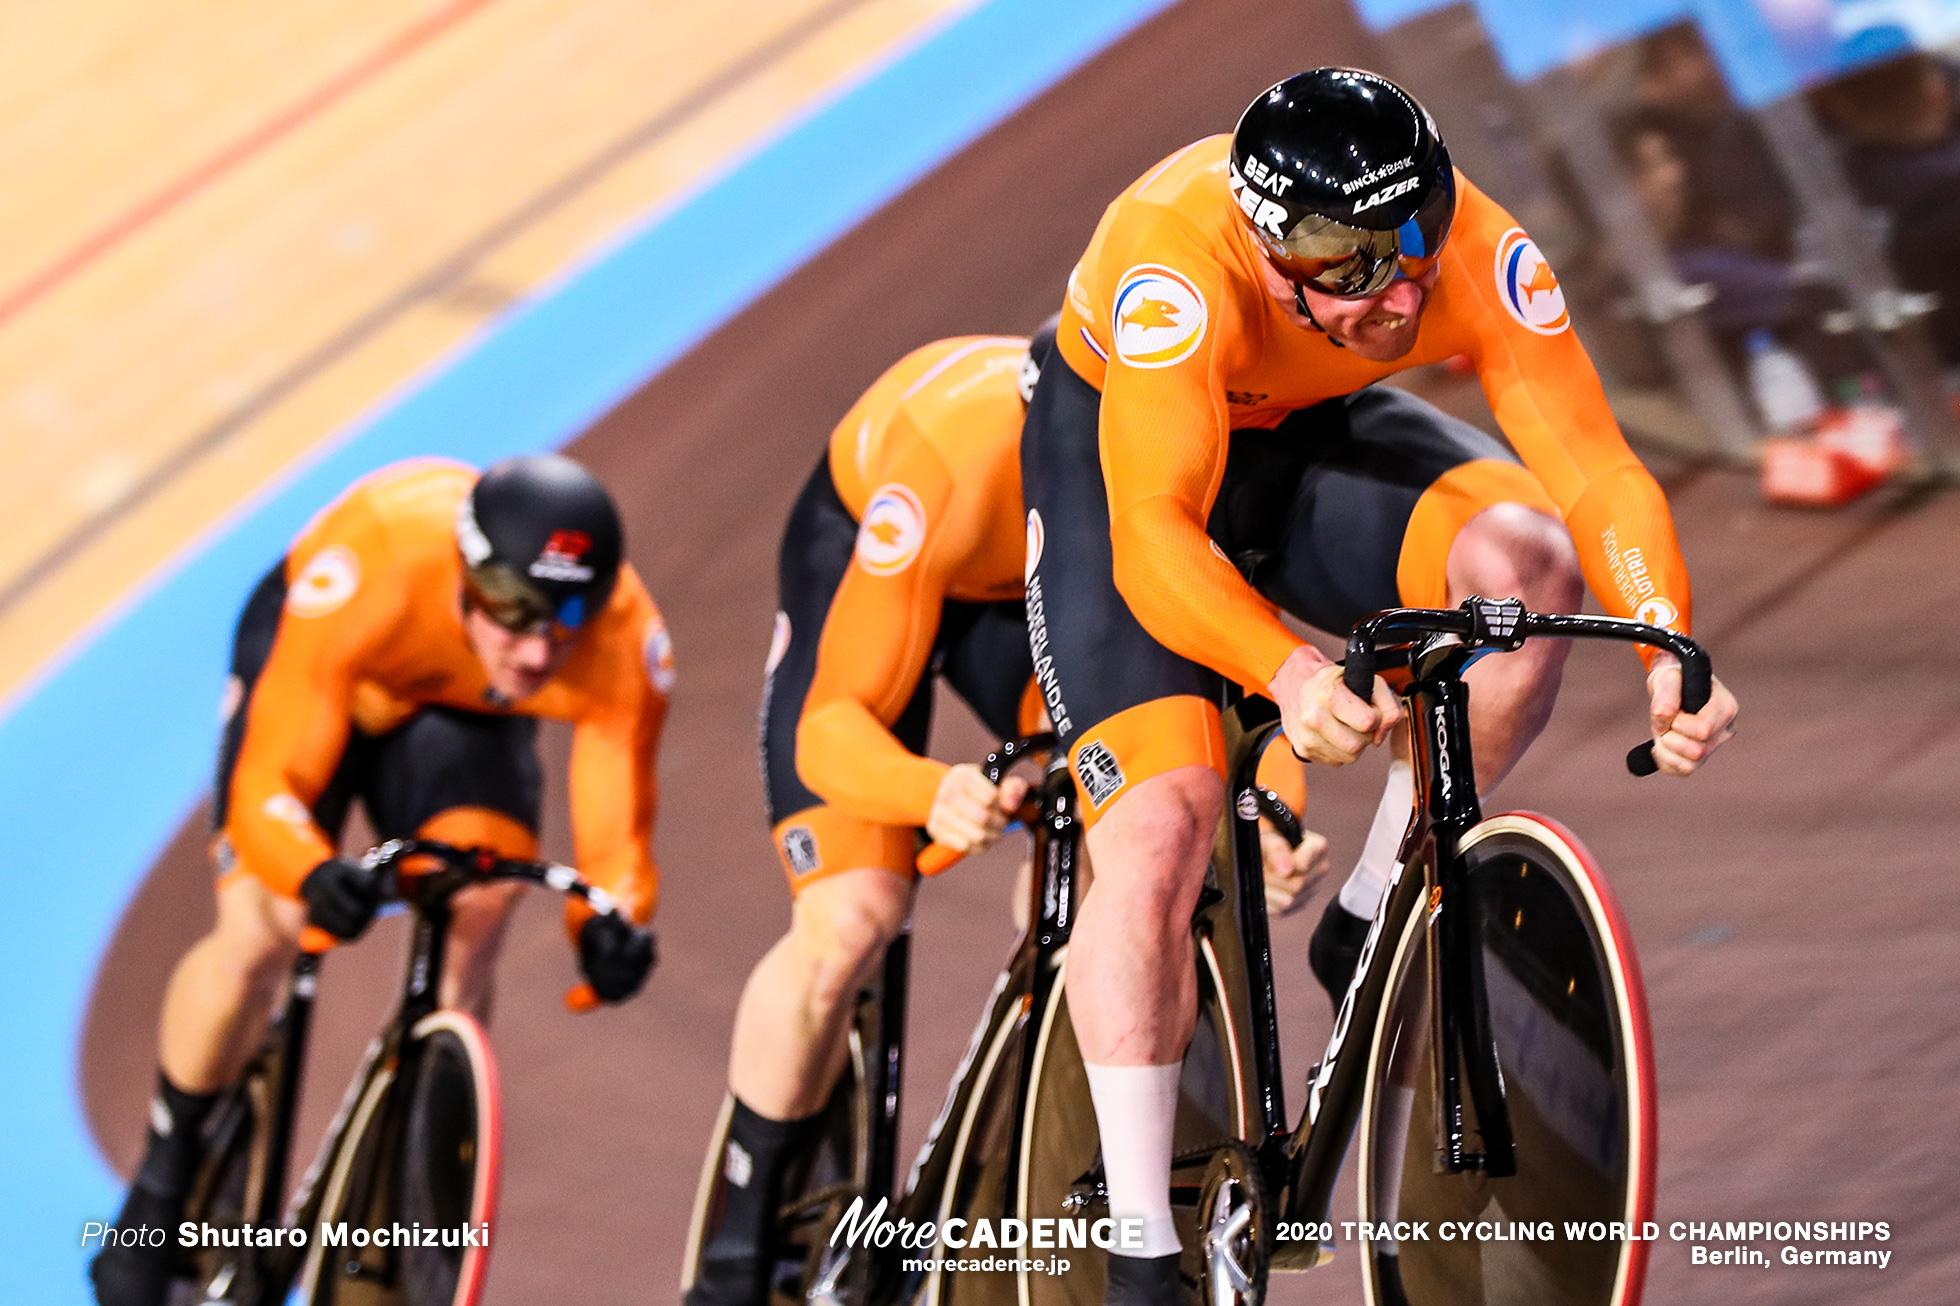 1st Round / Men's Team Sprint / 2020 Track Cycling World Championships, ロイ・バンデンバーグ Roy van den Berg, ハリー・ラブレイセン Harrie Lavreysen, ジェフリー・ホーフラント Jeffrey Hoogland